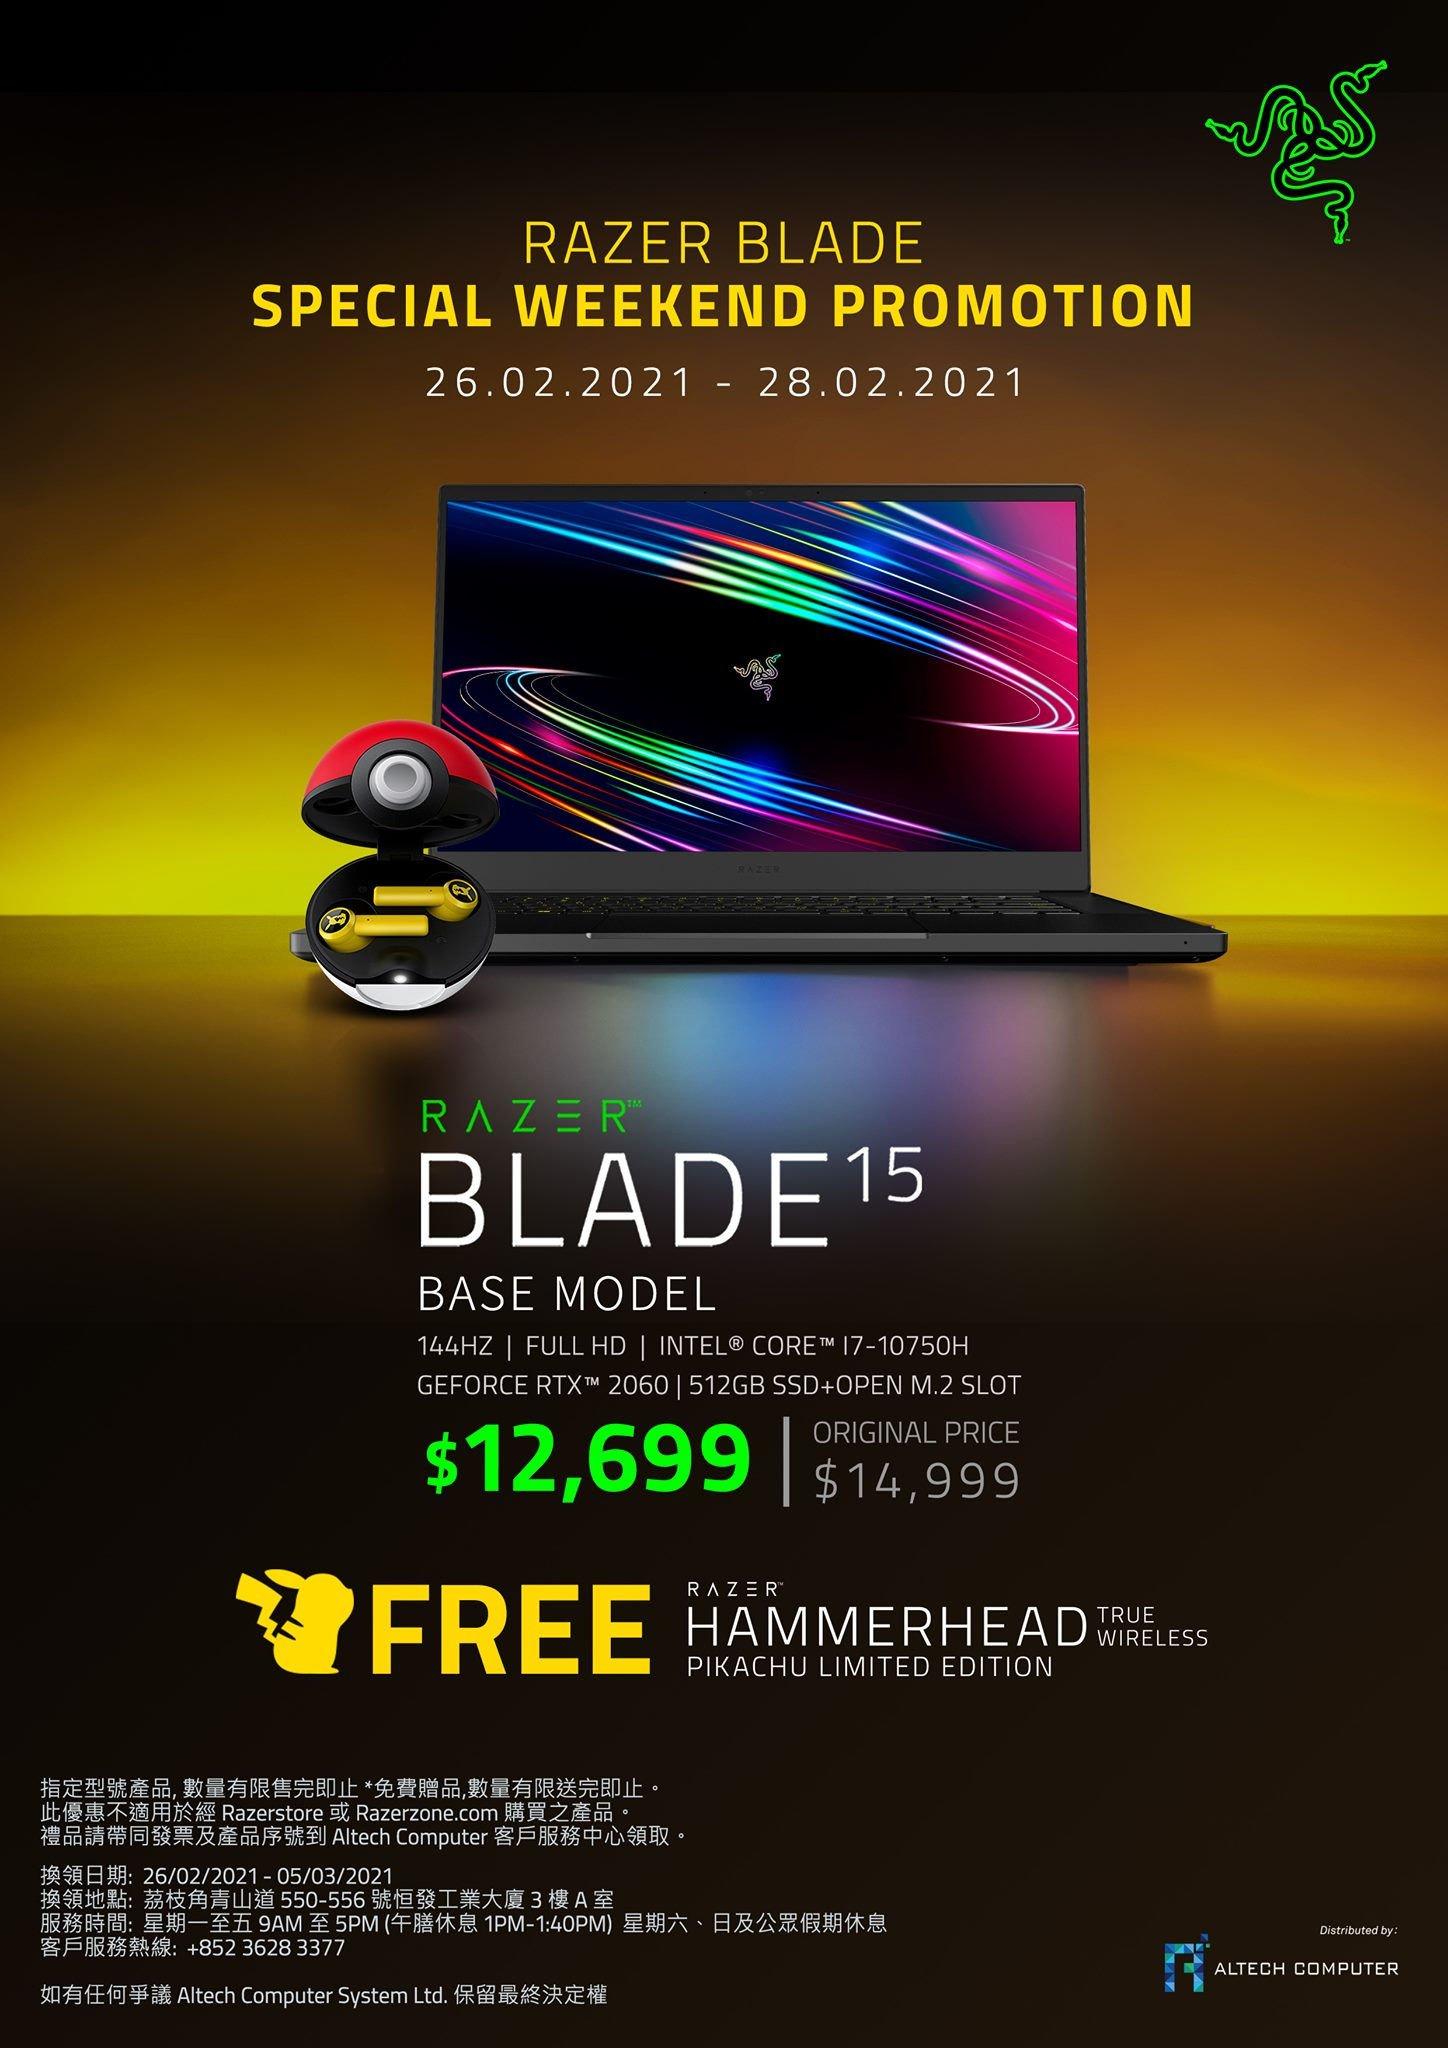 Razer Special Weekend Promotion